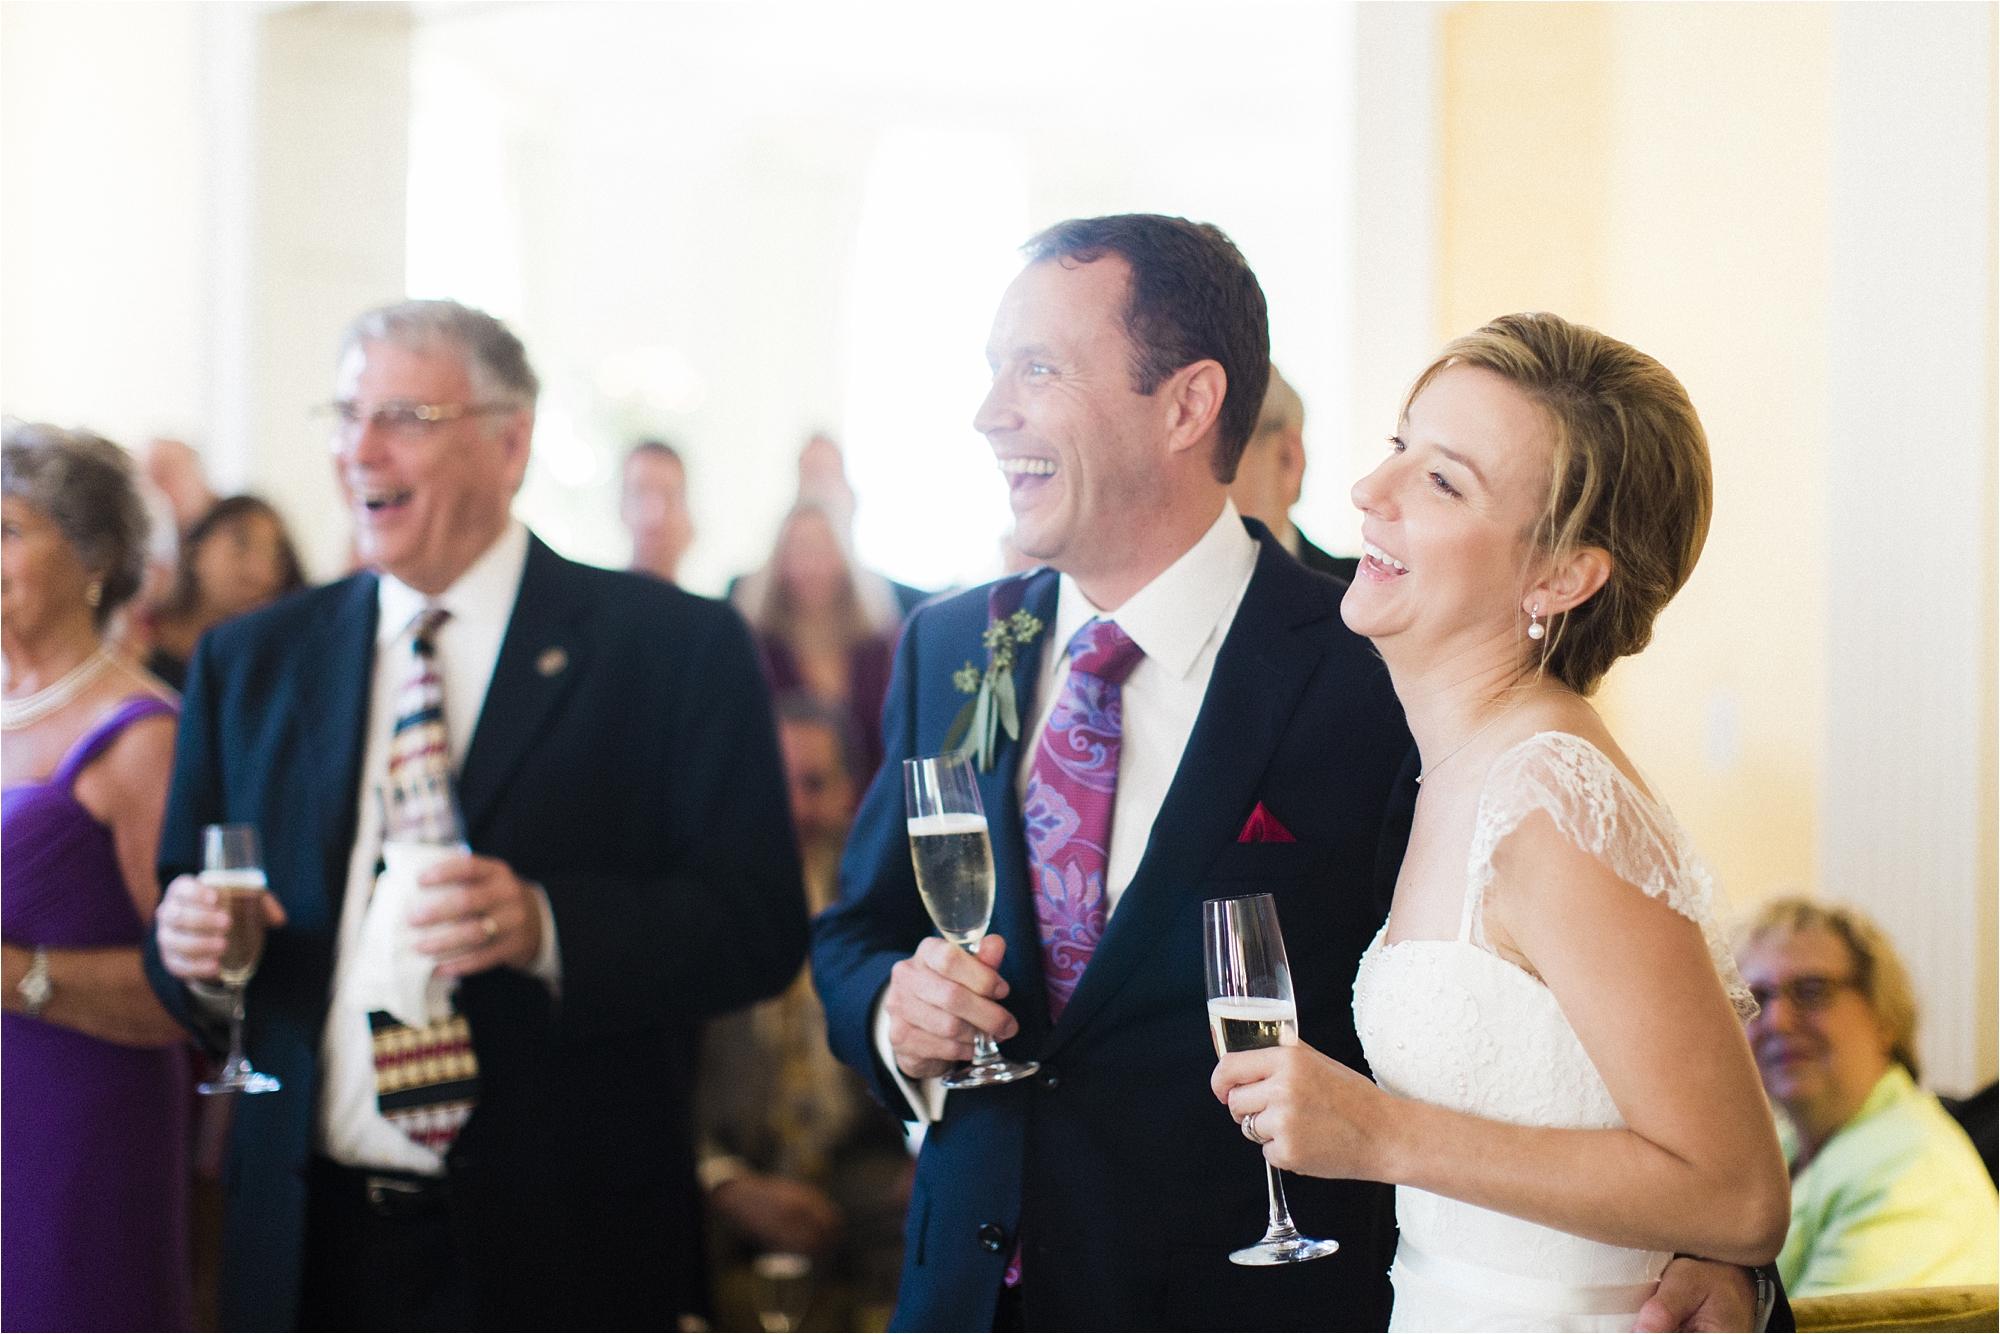 stephanie-yonce-photography-elegant-private-club-washington-dc-wedding-photos_0068.jpg